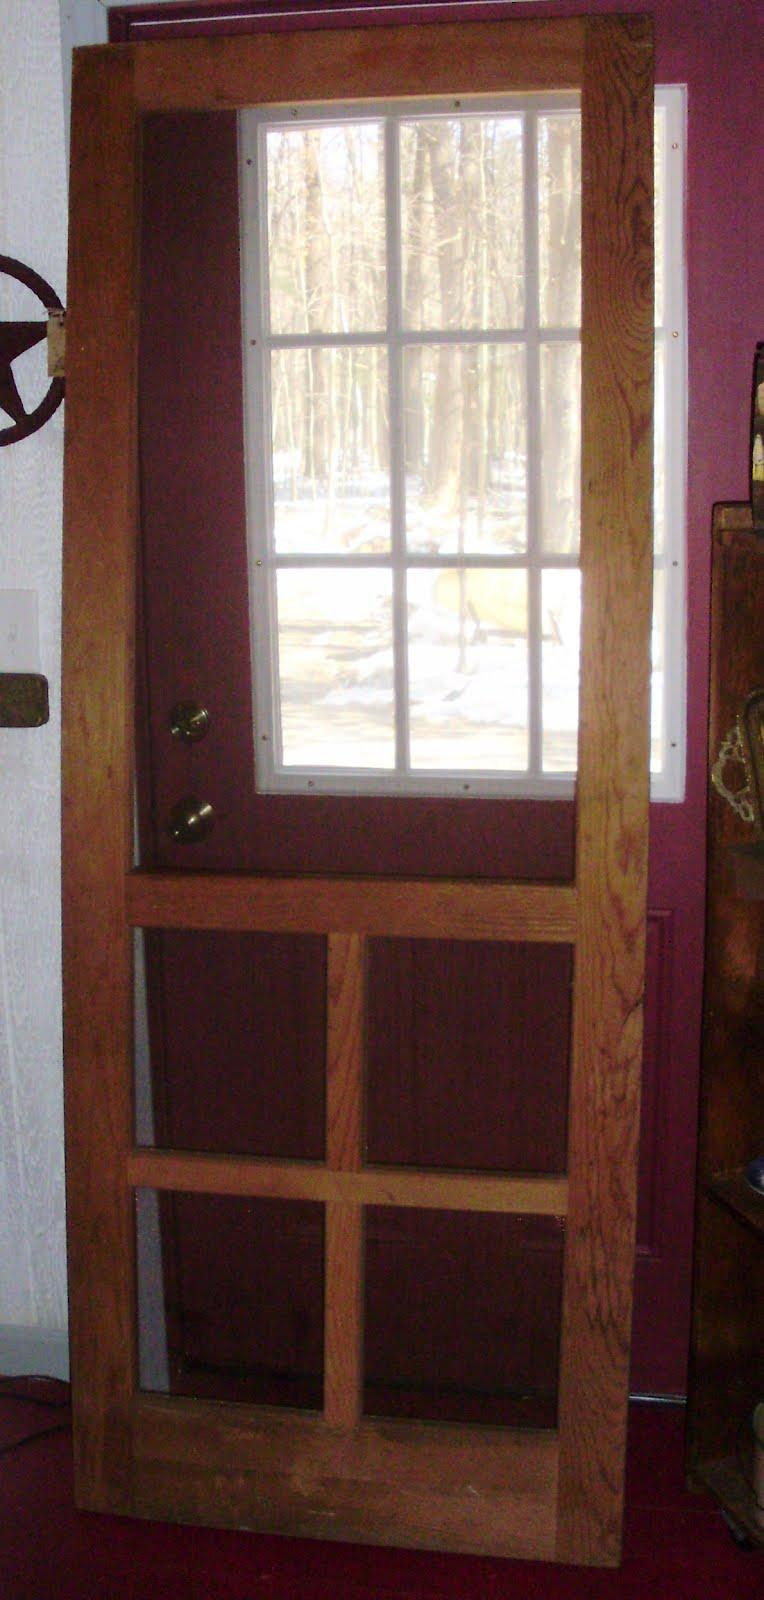 Country Screen Doors : Log cabin antiques gifts wooden screen door from